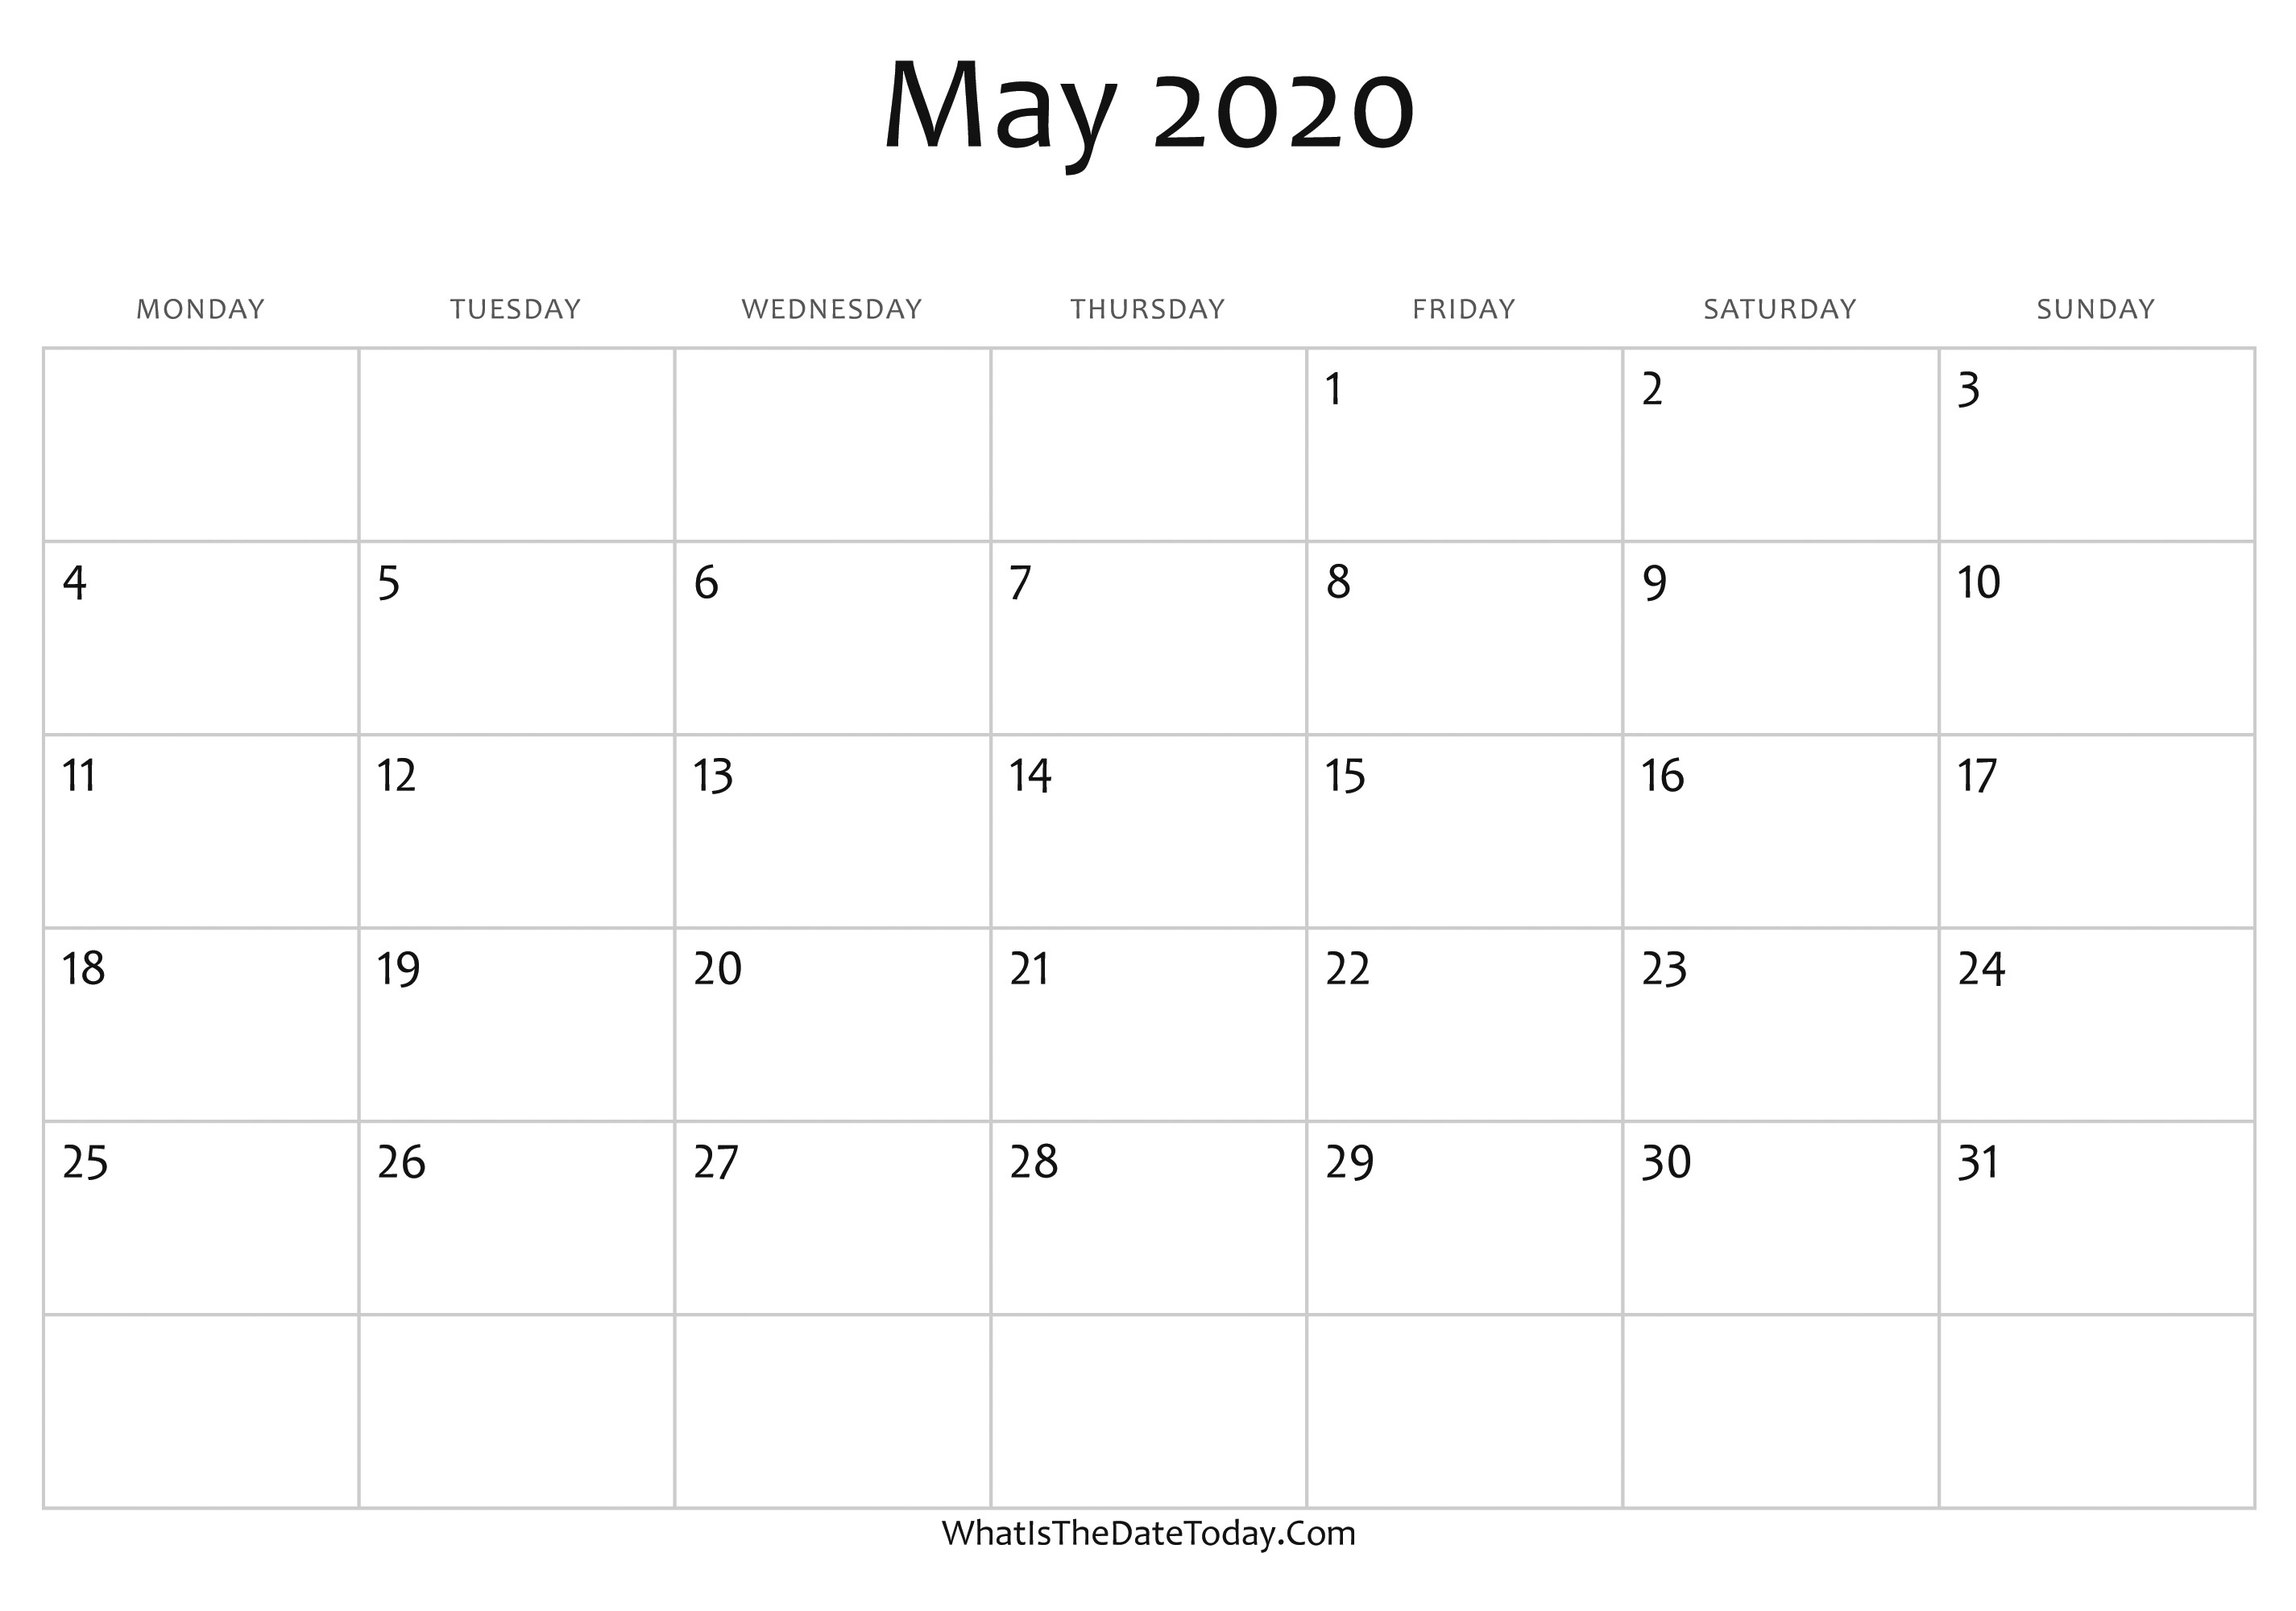 May 2020 Calendar Blank Landscape In   Otohondalongan with Mayan Calendar 2020